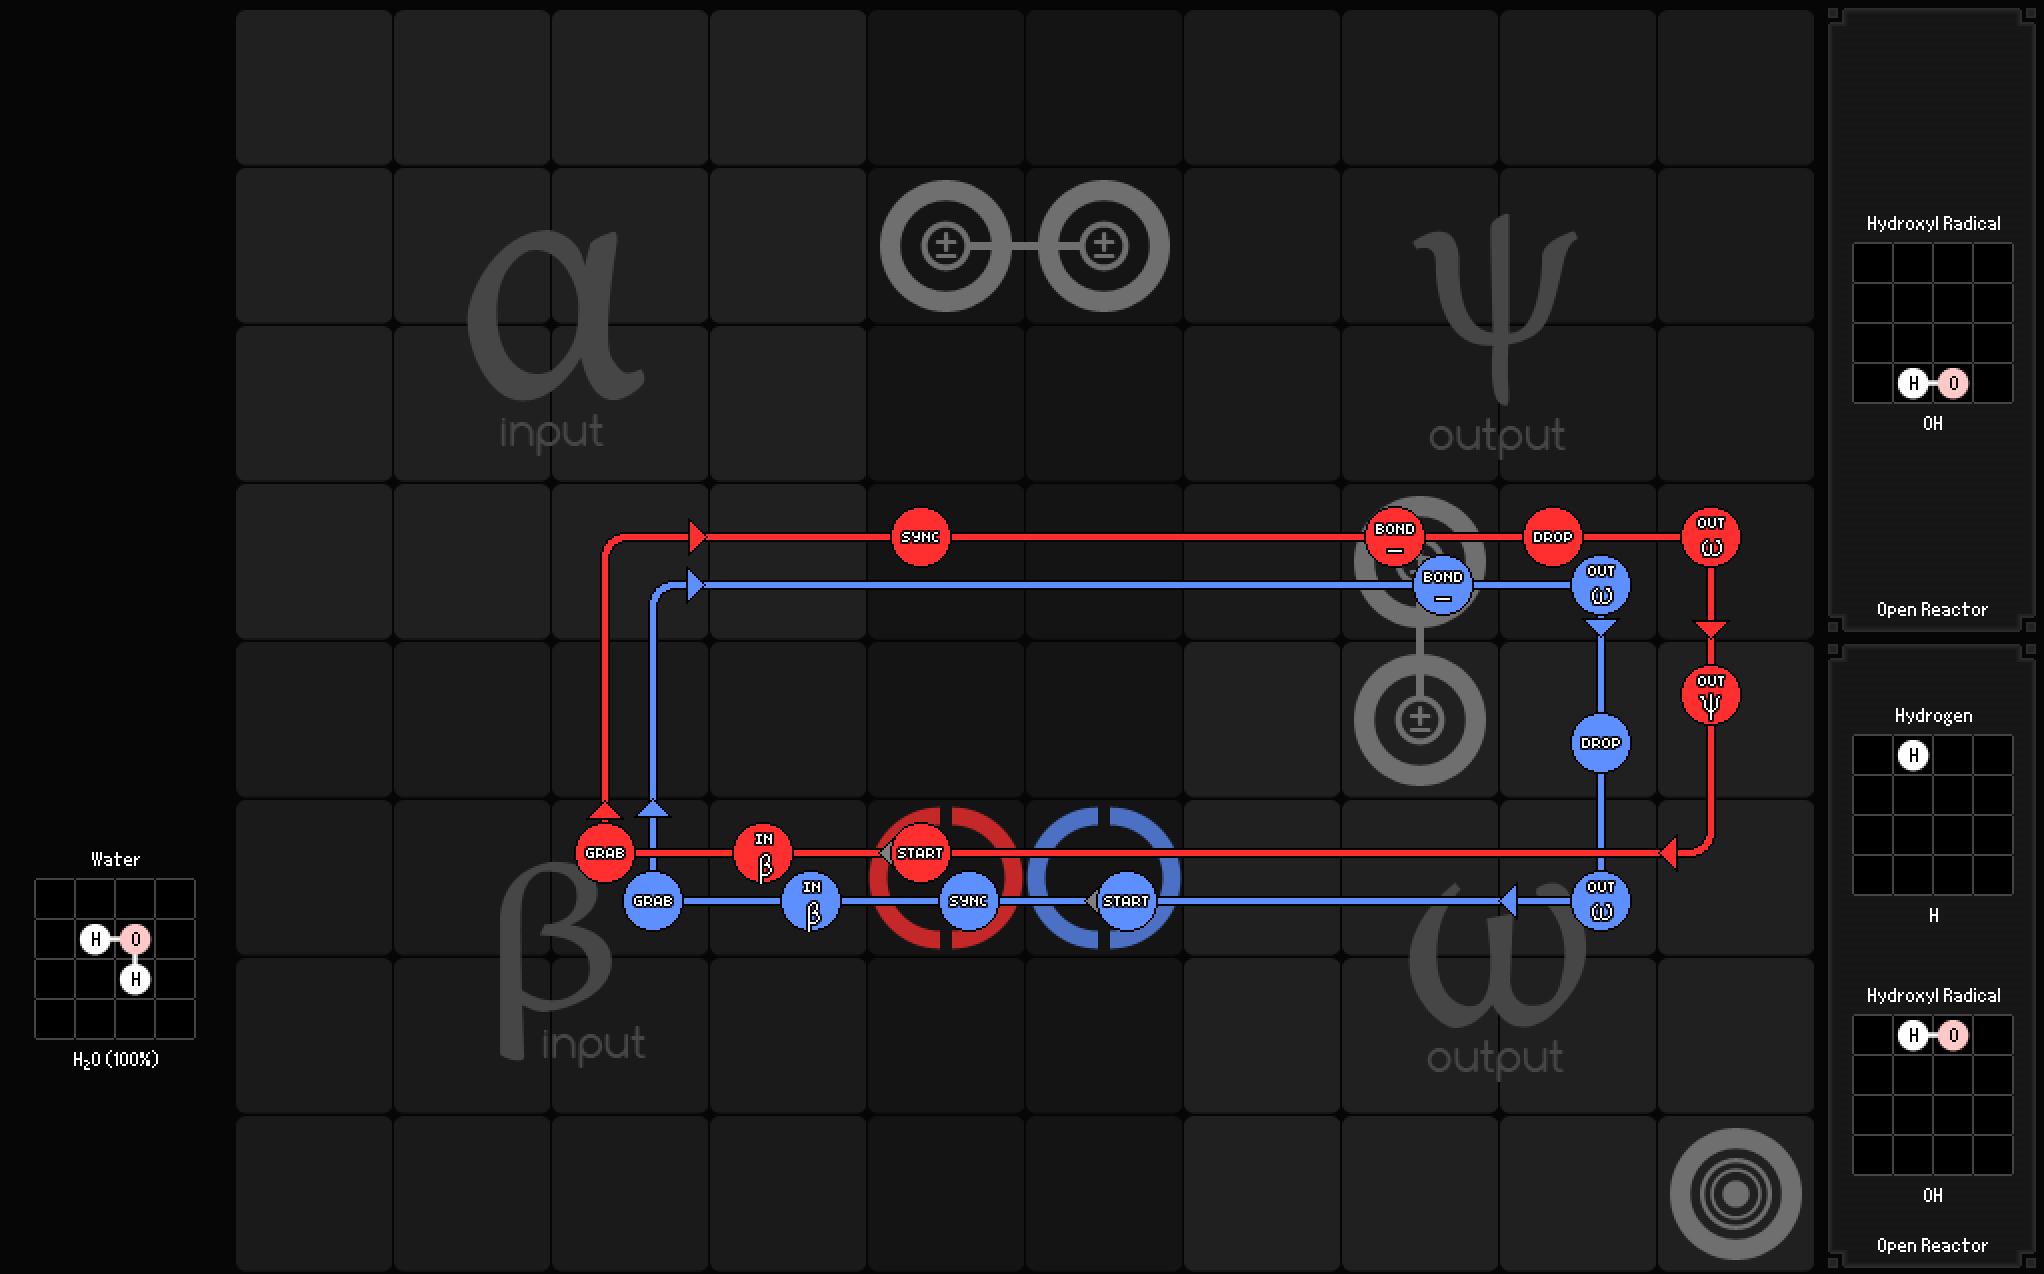 1_Story_Mode/5_Sikutar/SpaceChem-5.5.a/Reactor_1.png